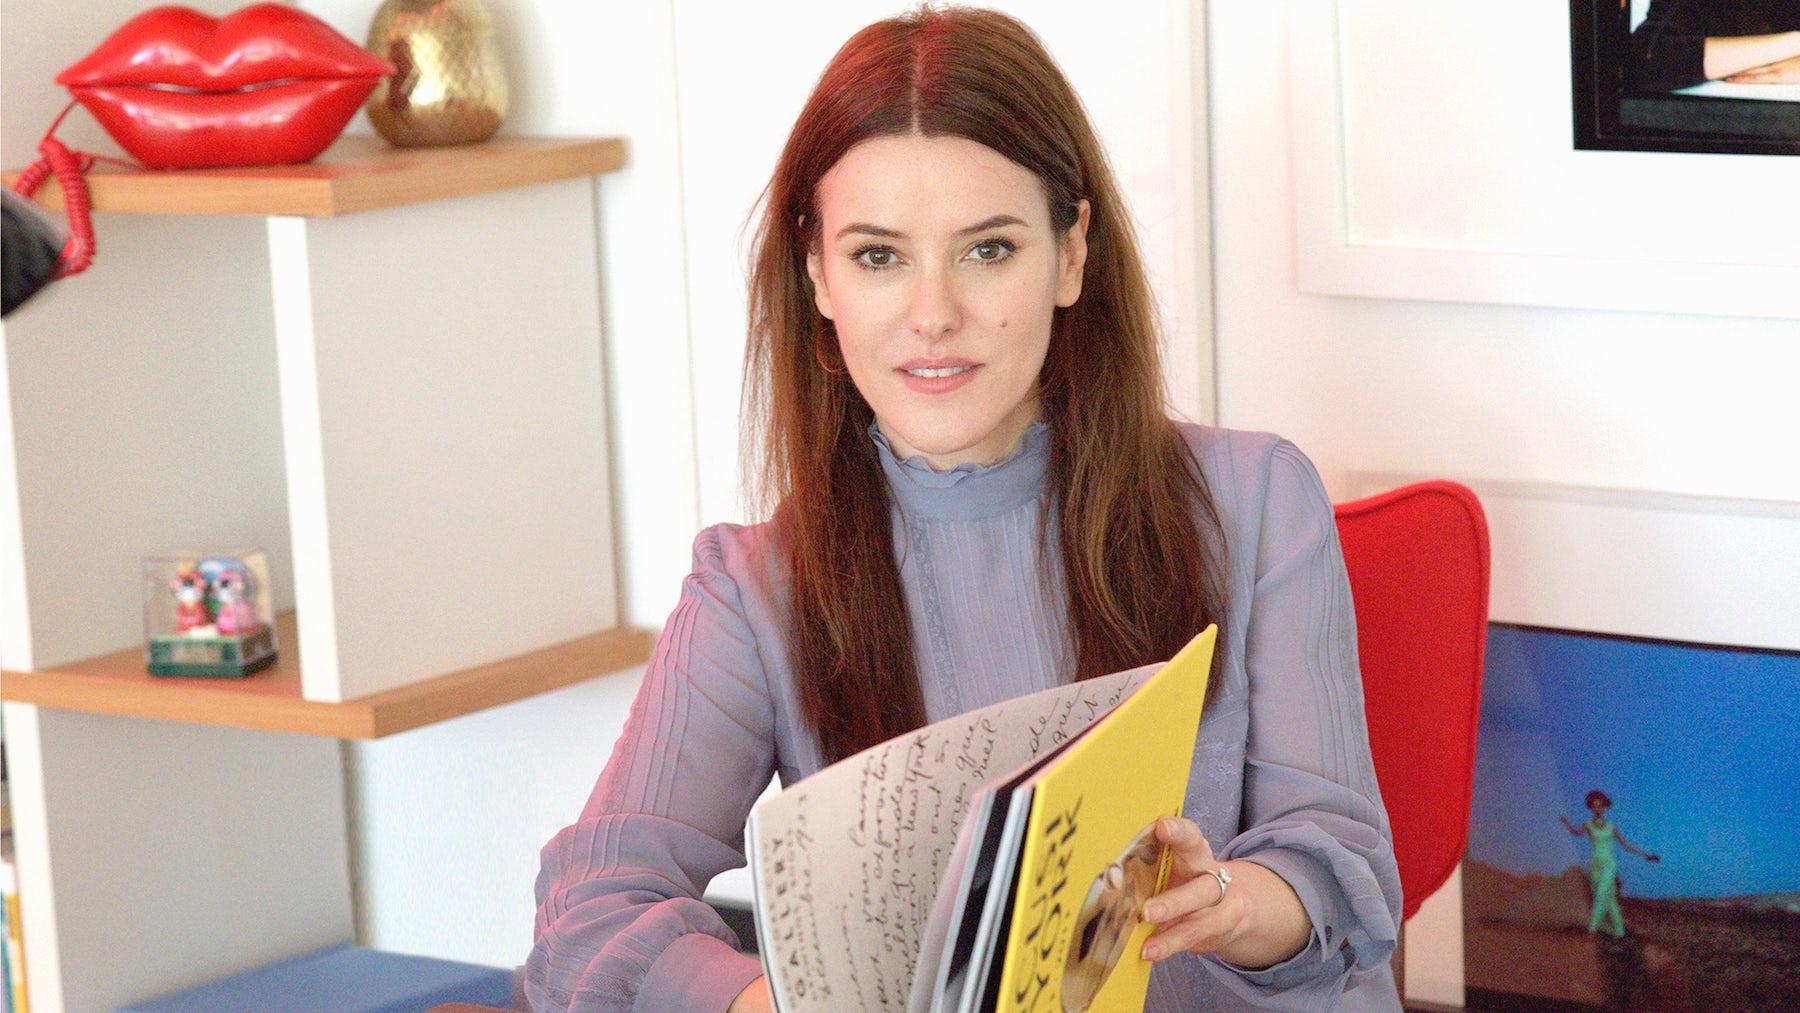 Lisa Eldridge | Michael Hemy for BoF